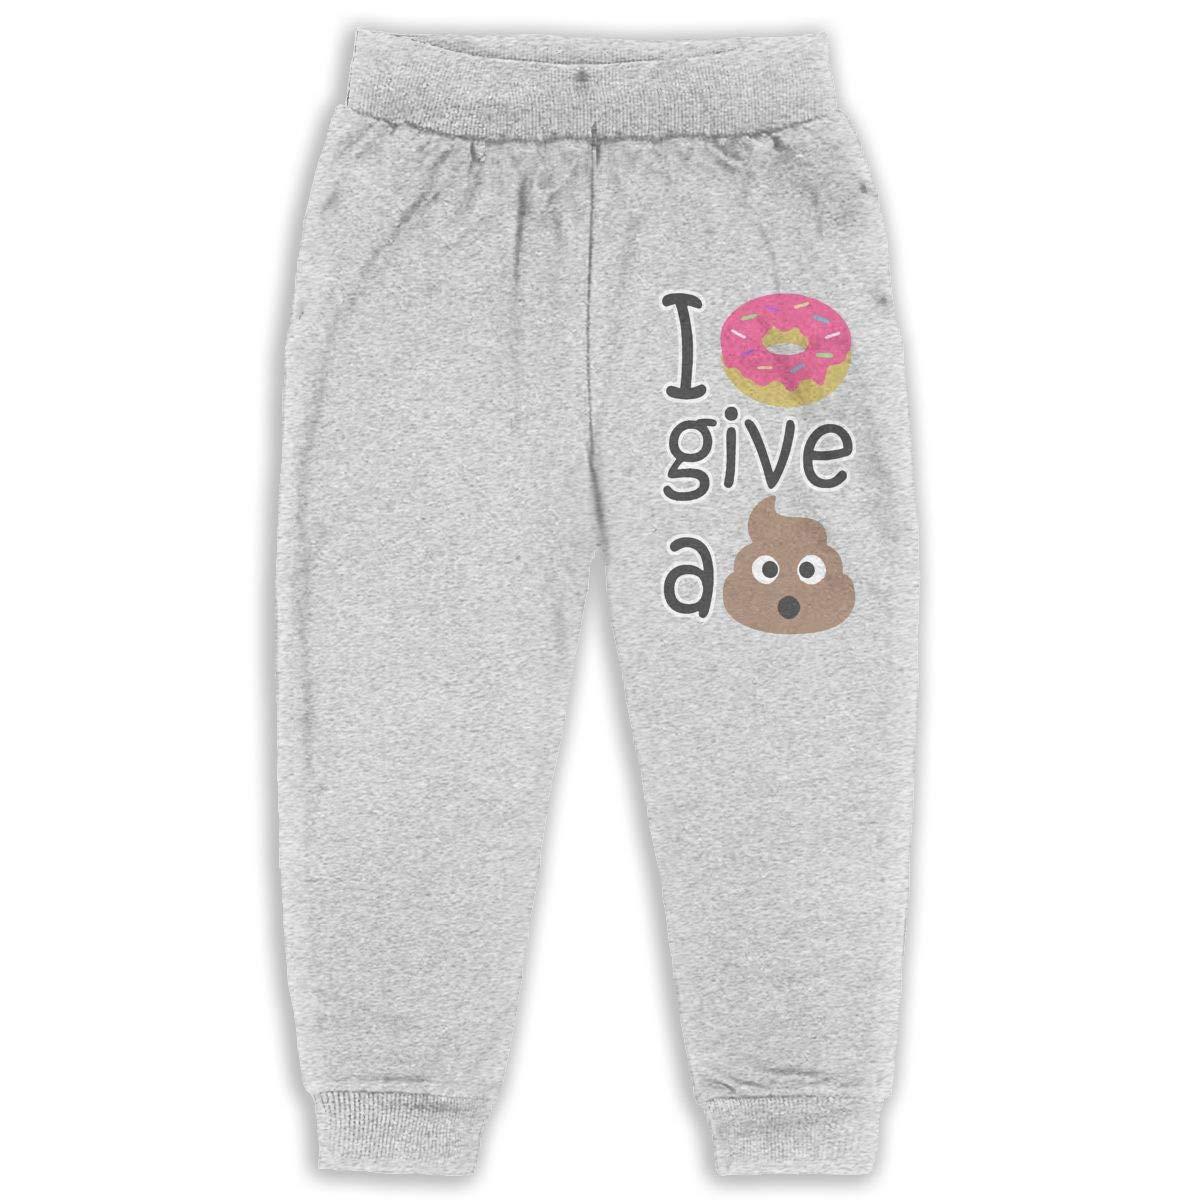 I Donut Give A Shit Sweatpants for Boys /& Girls Fleece Active Joggers Elastic Pants